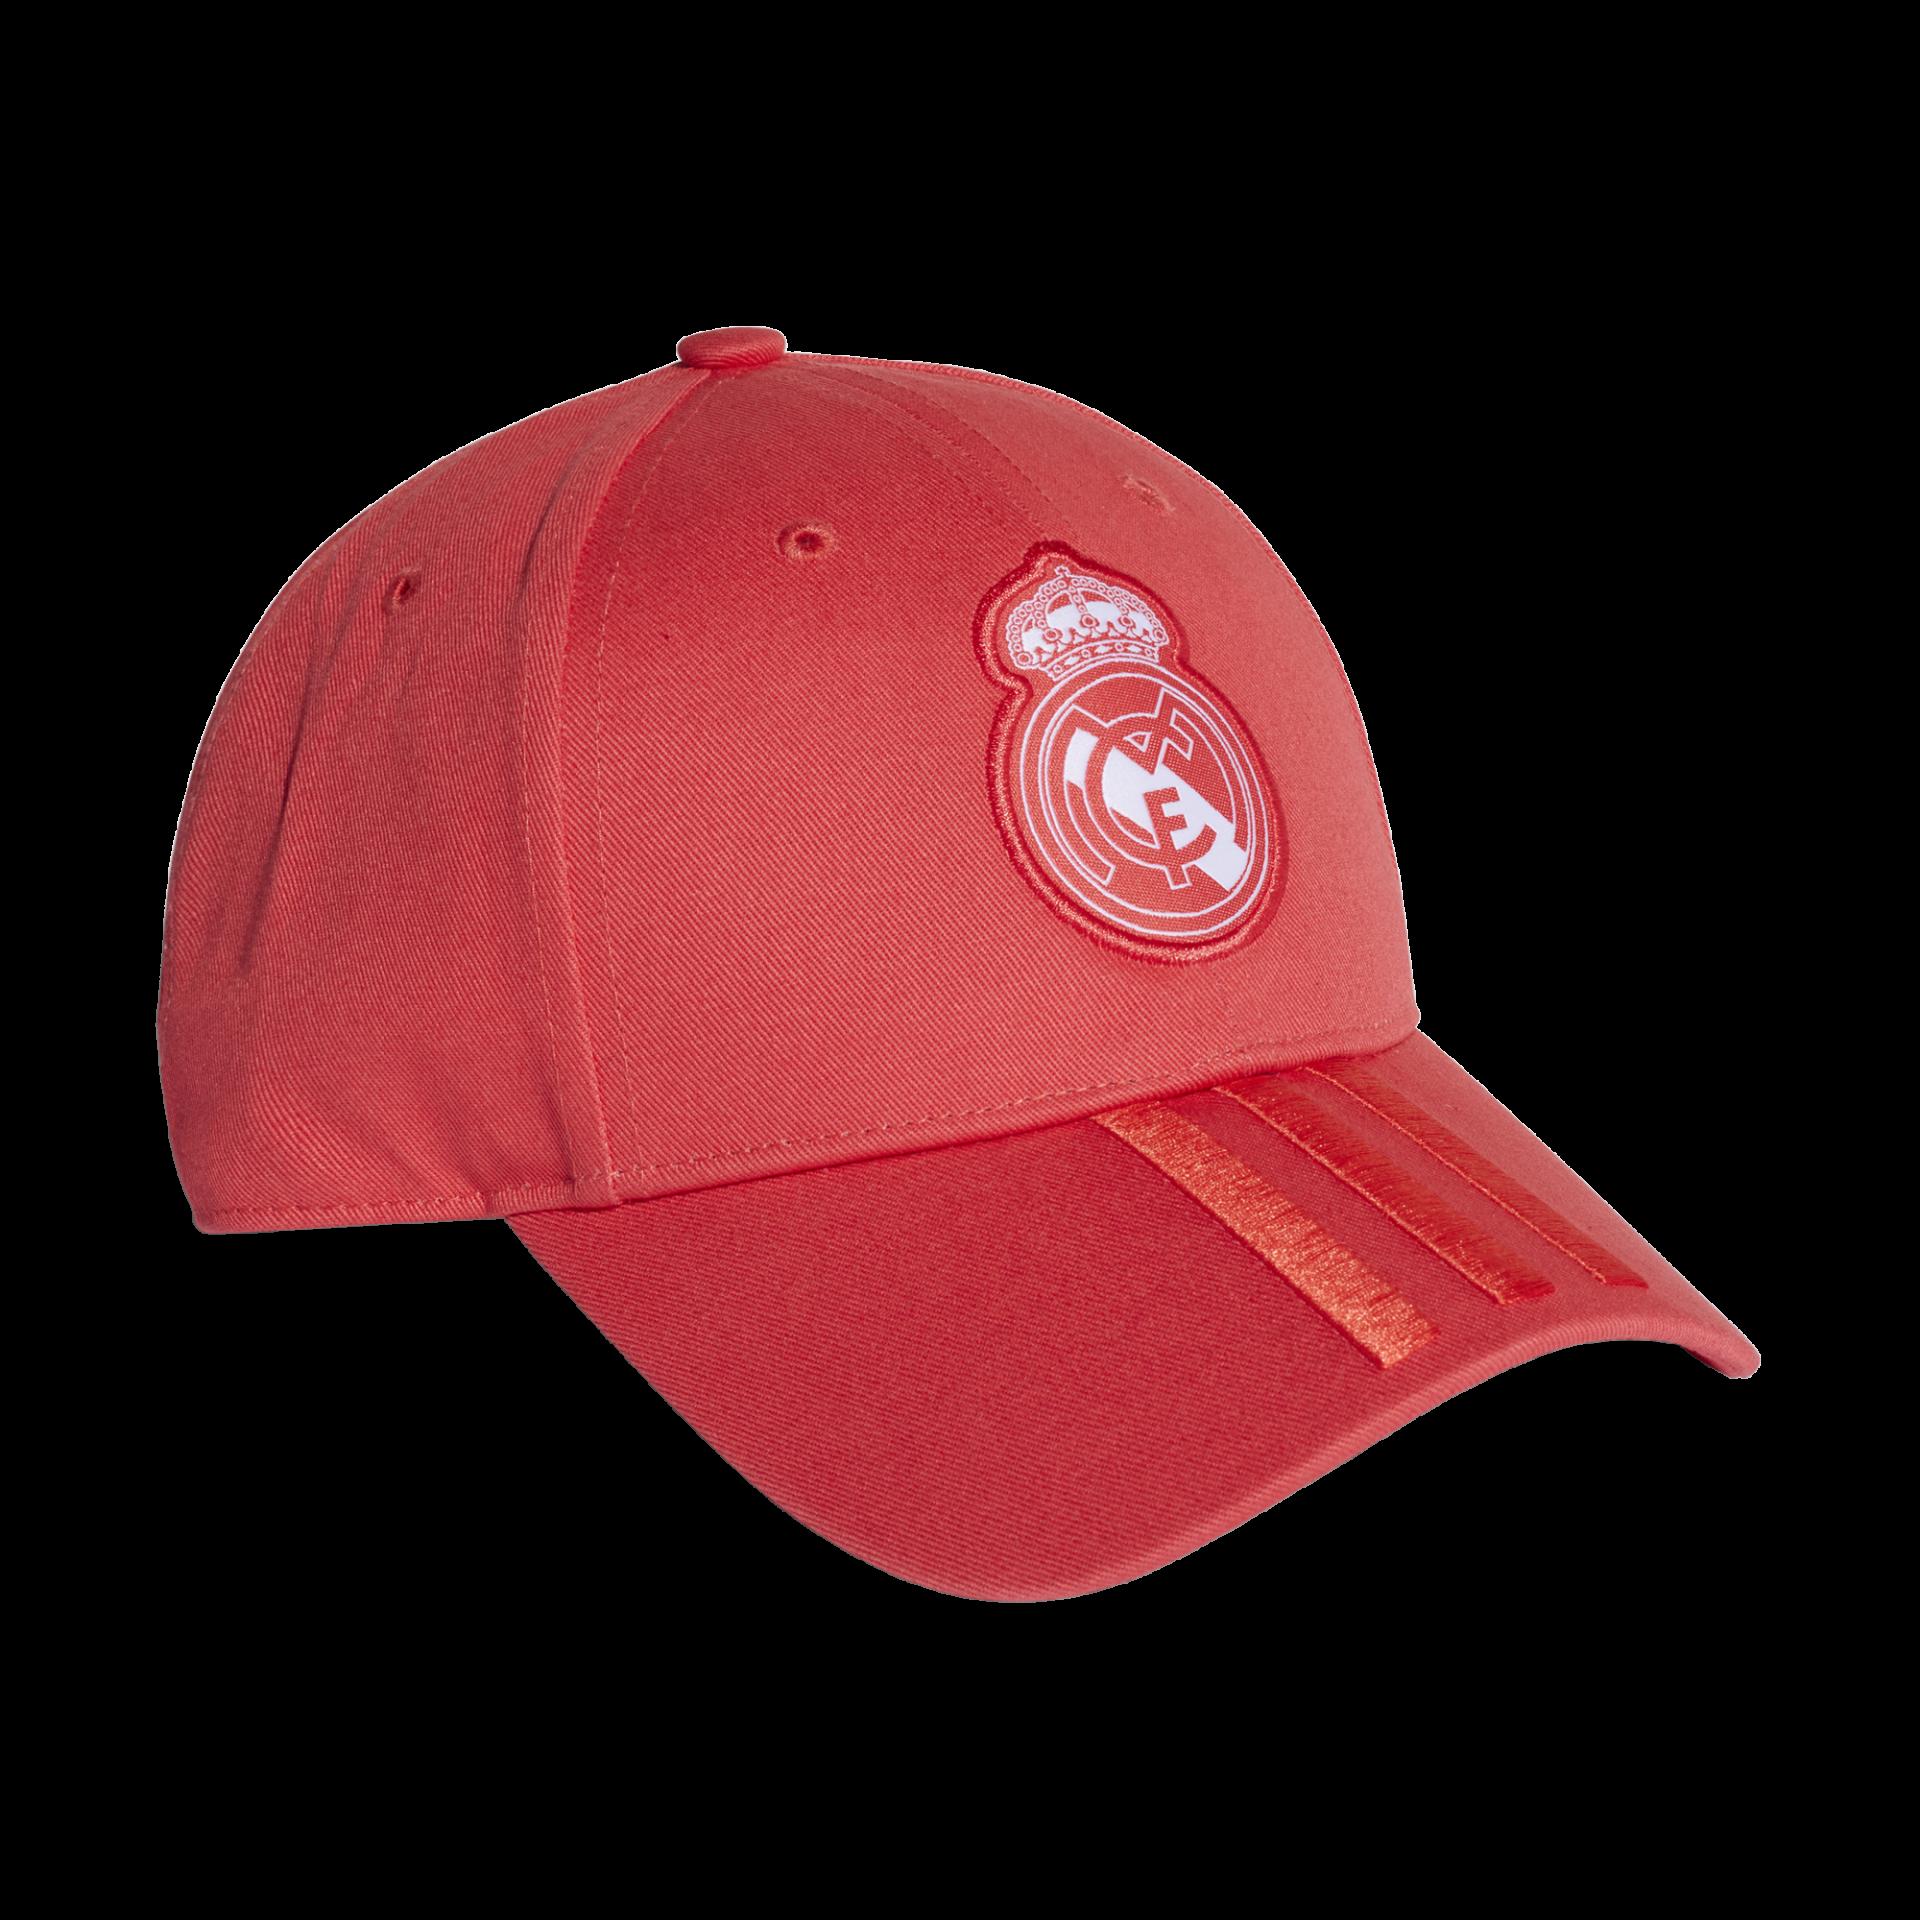 GORRA REAL MADRID ROJO CZ6101 REAL 3S CAP